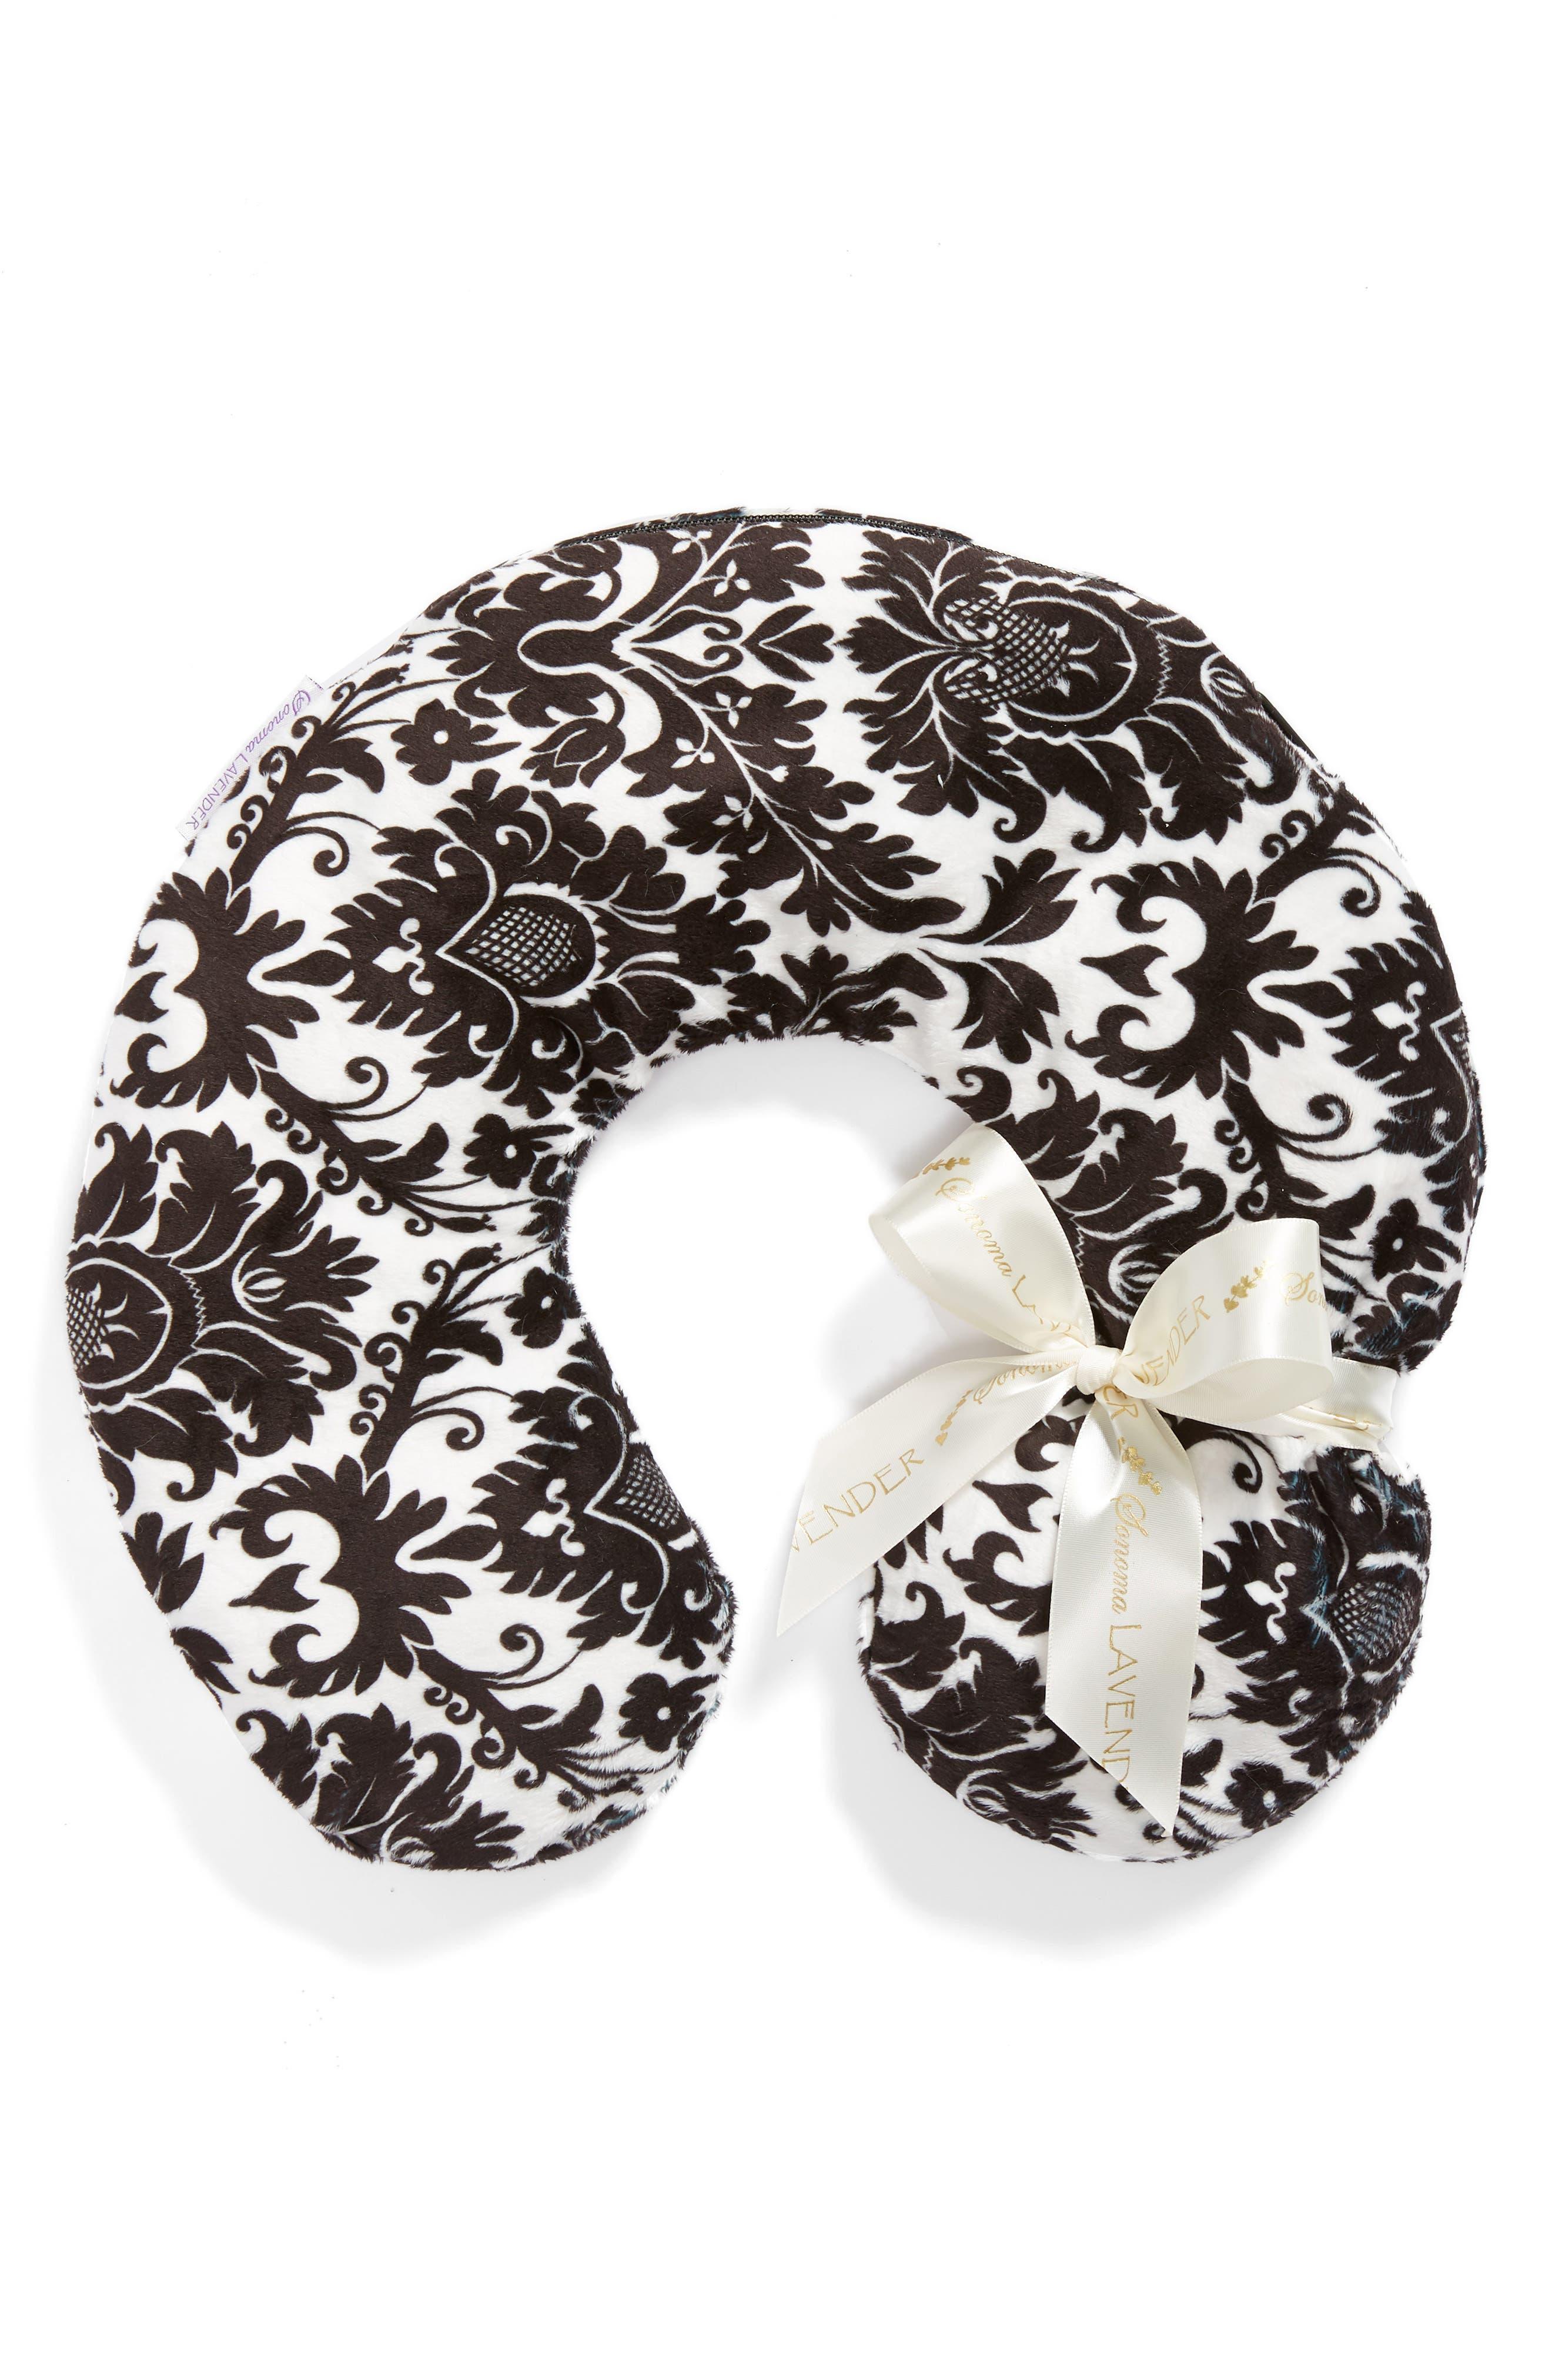 Main Image - Sonoma Lavender Black Damask Neck Pillow (Limited Edition)